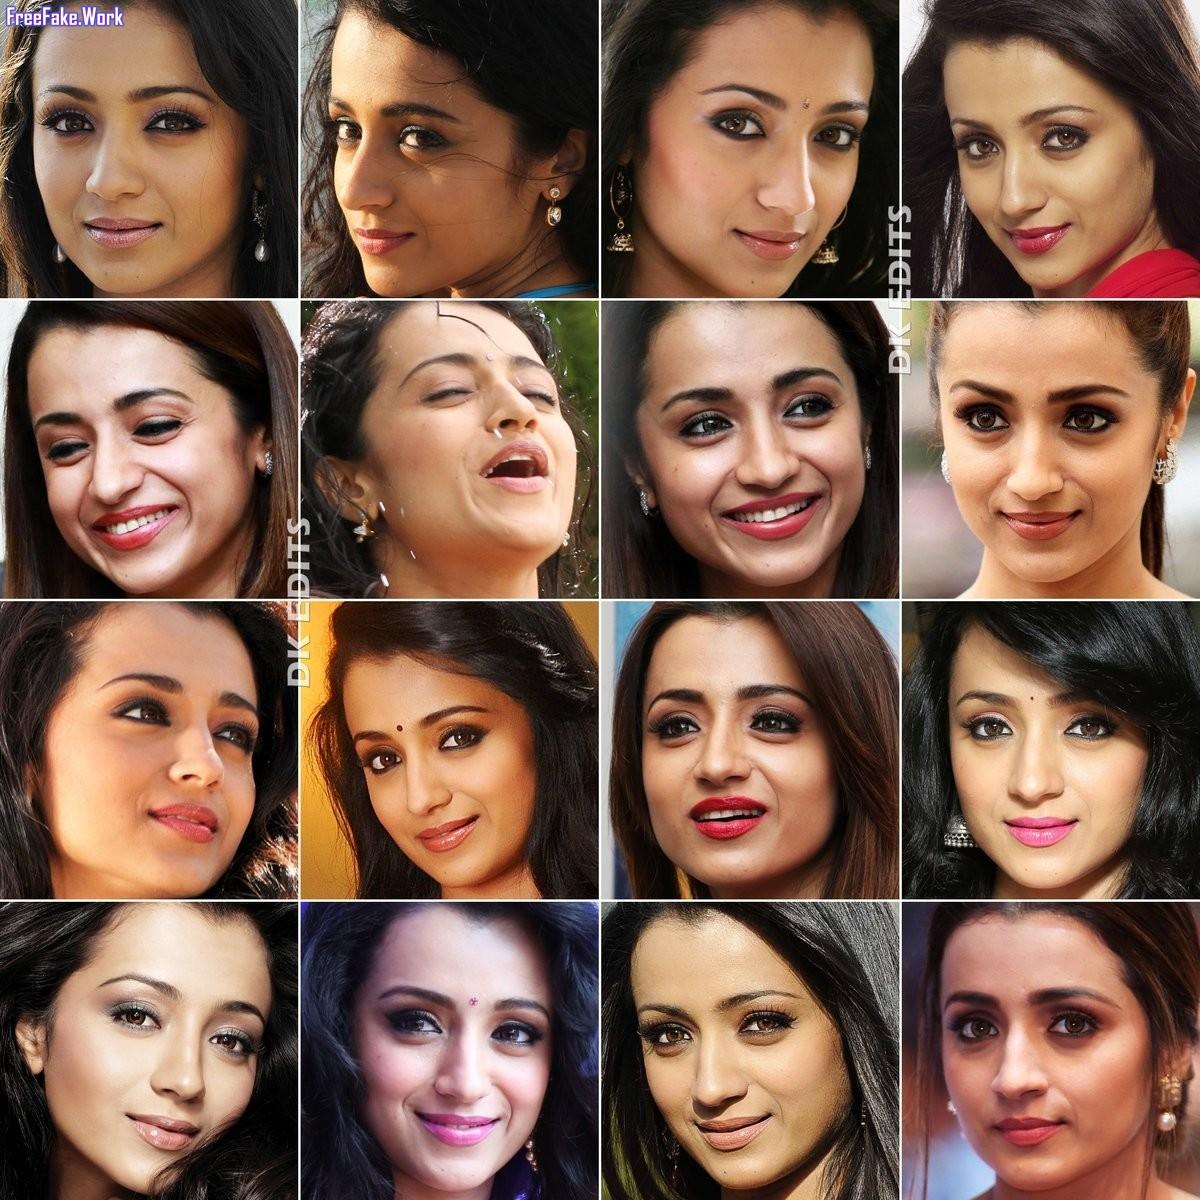 Trisha-Krishnan-sexy-cute-face.jpg